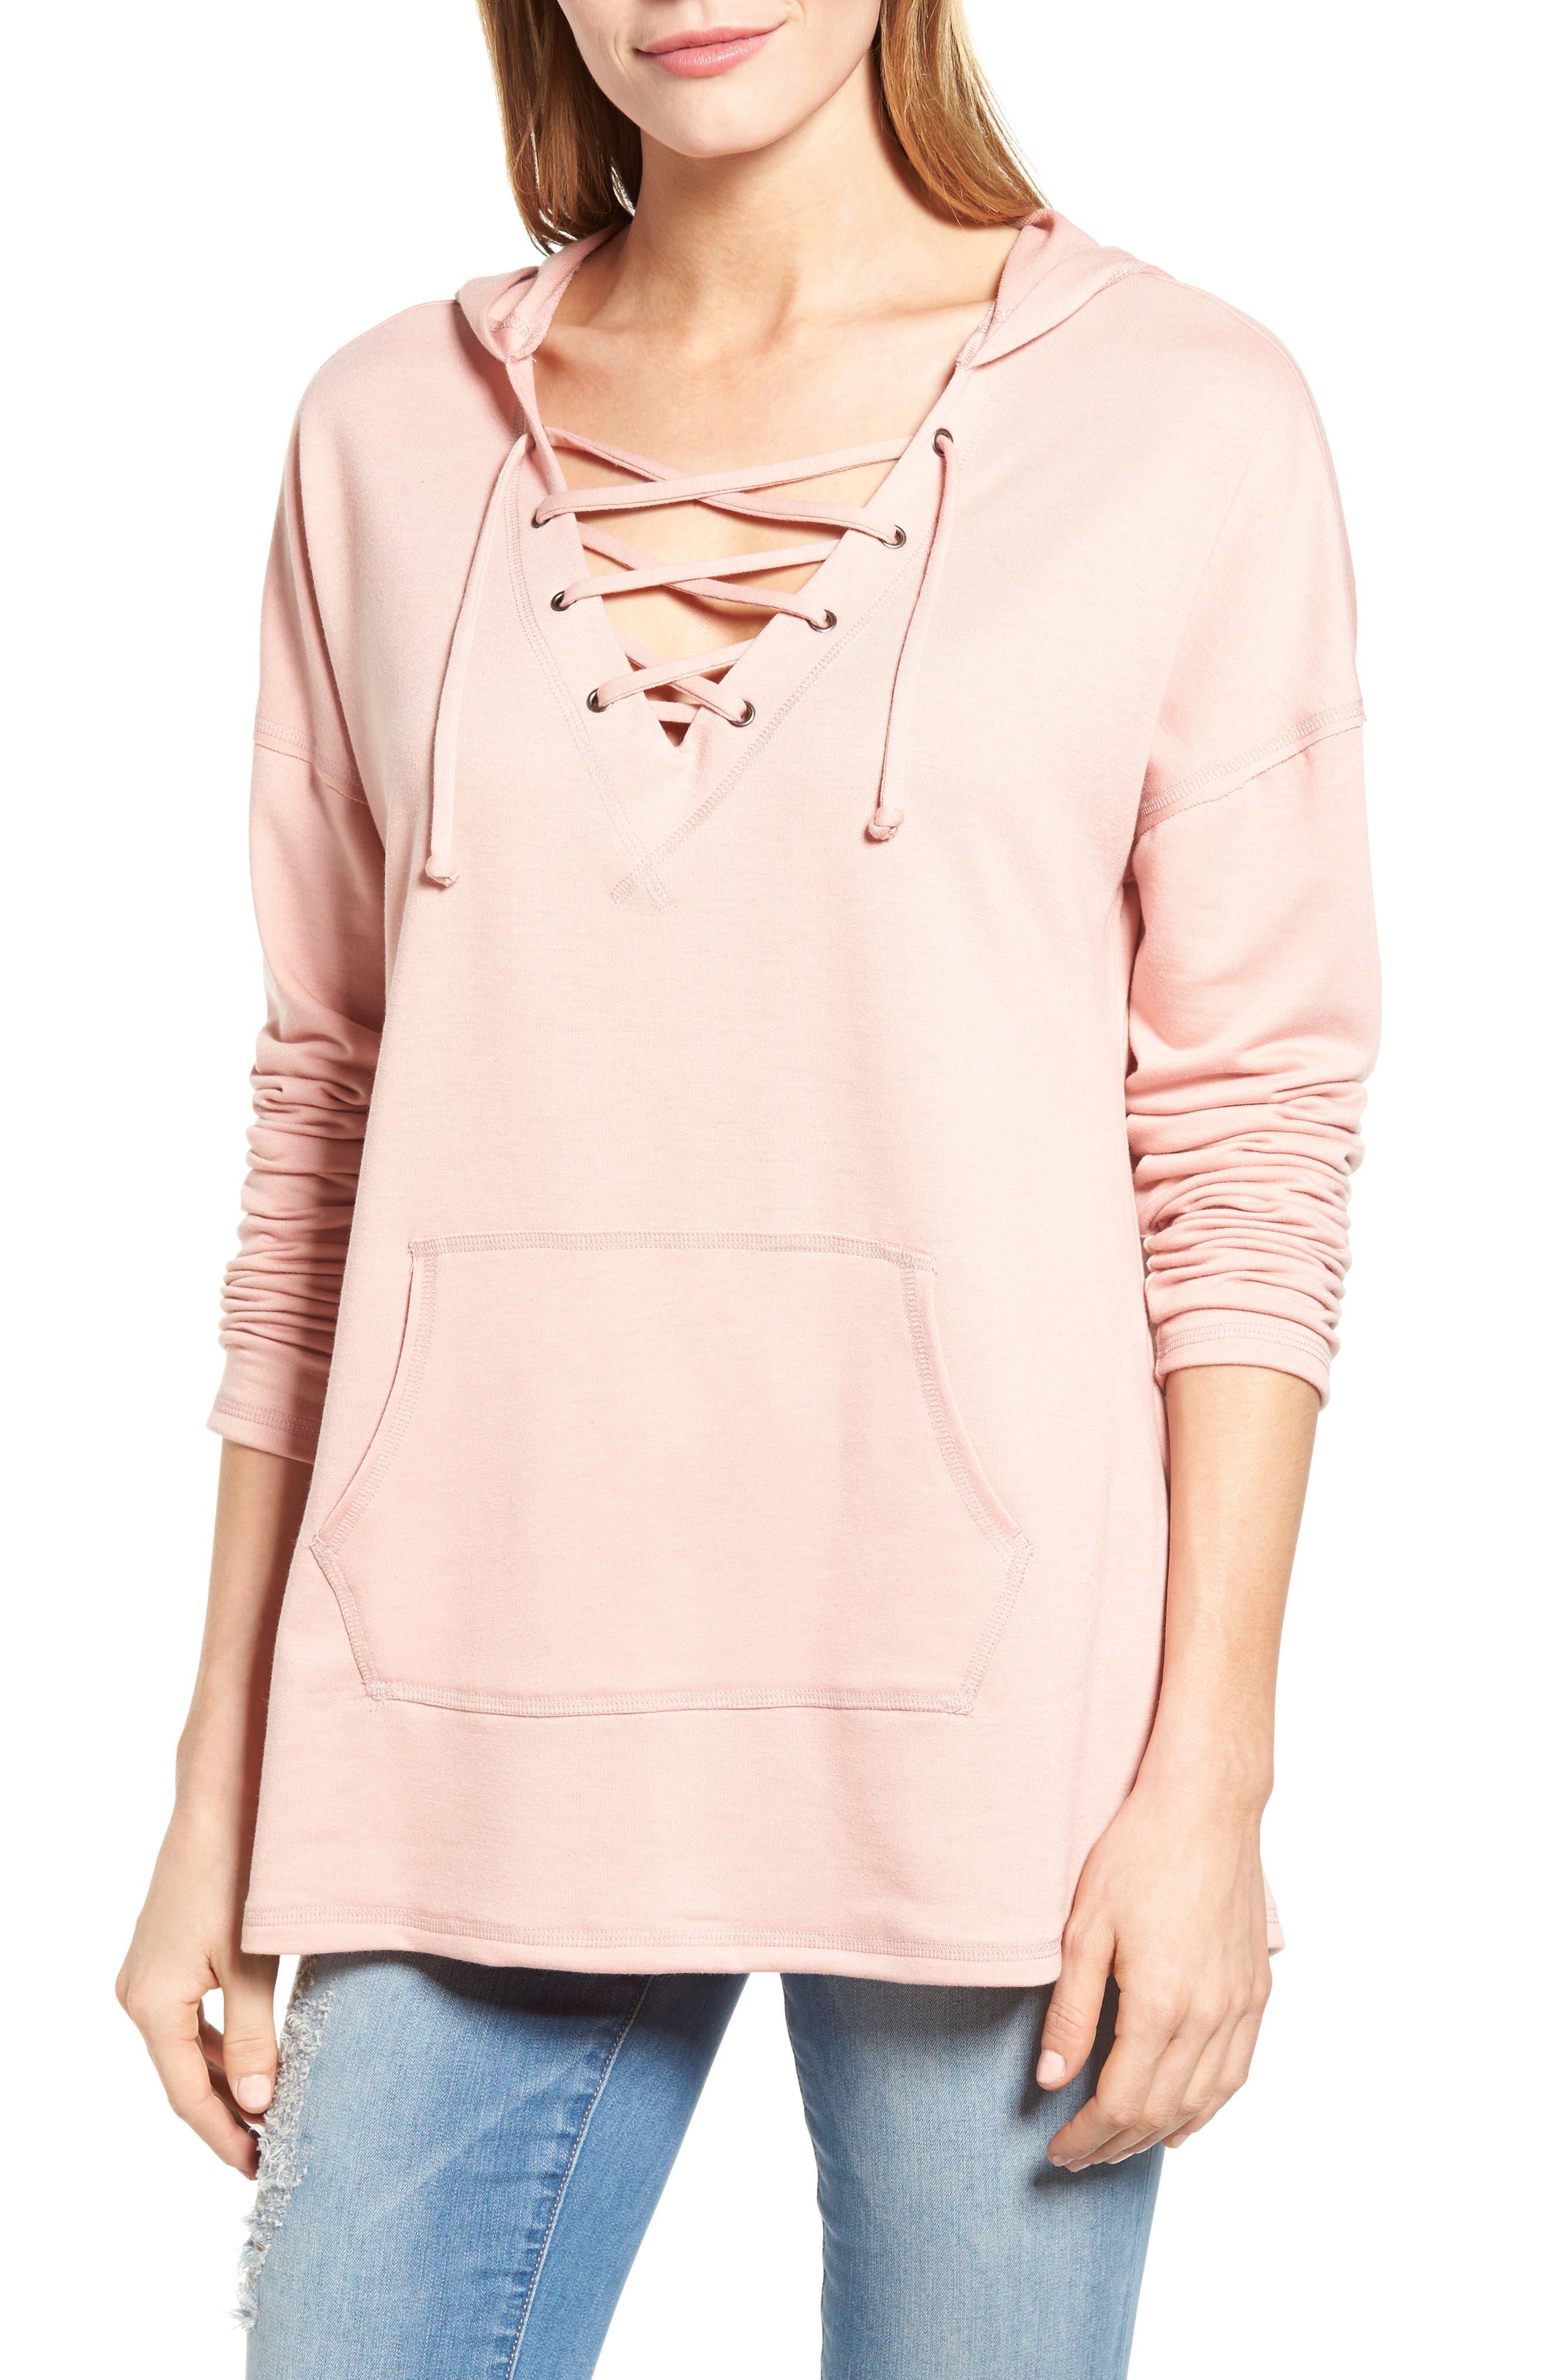 Alternate Image 1 Selected - Caslon® Lace-Up Hooded Sweatshirt (Regular & Petite)